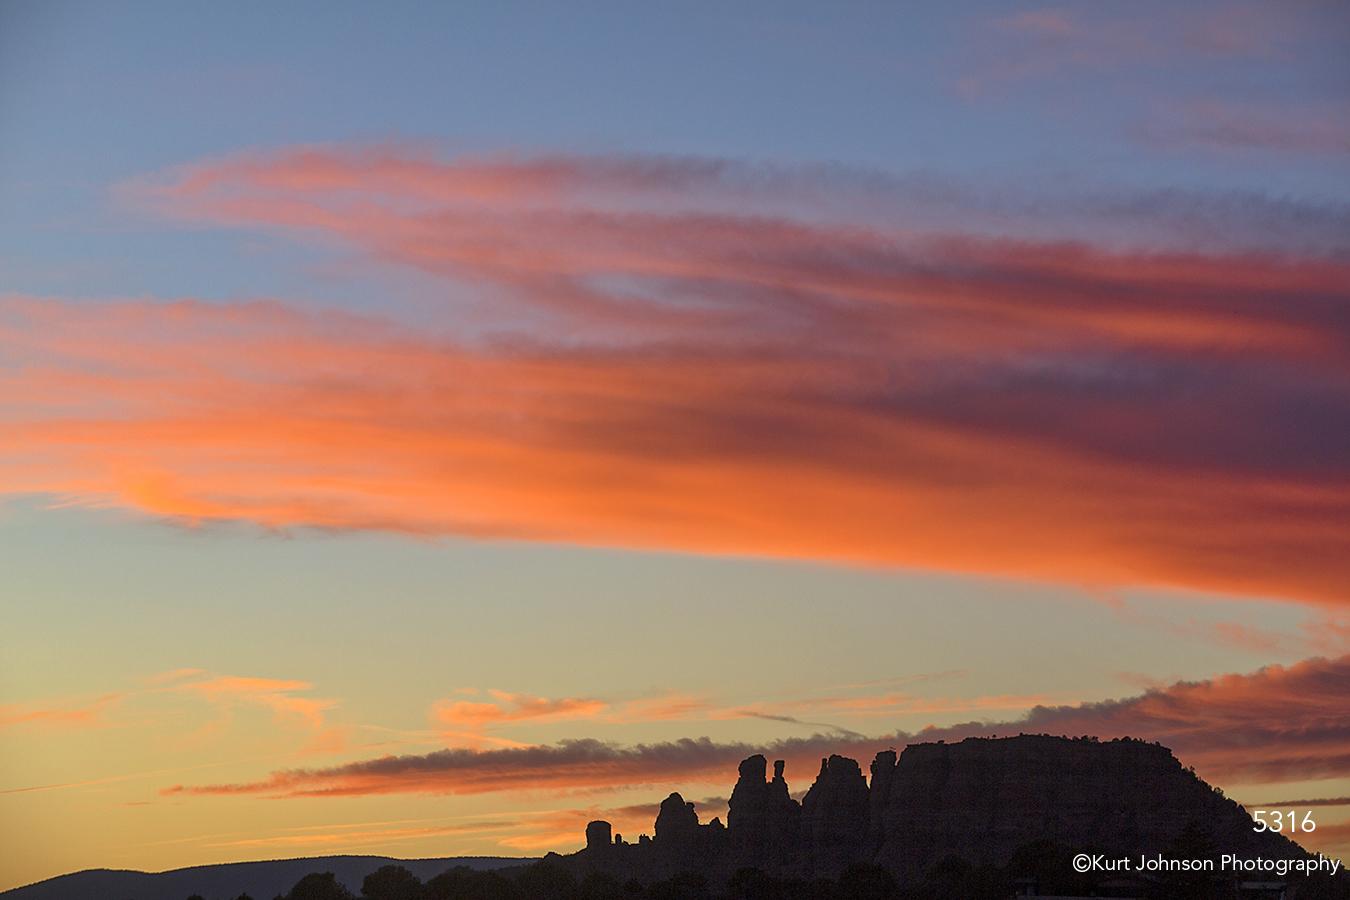 southwest landscape sunset desert trees pink